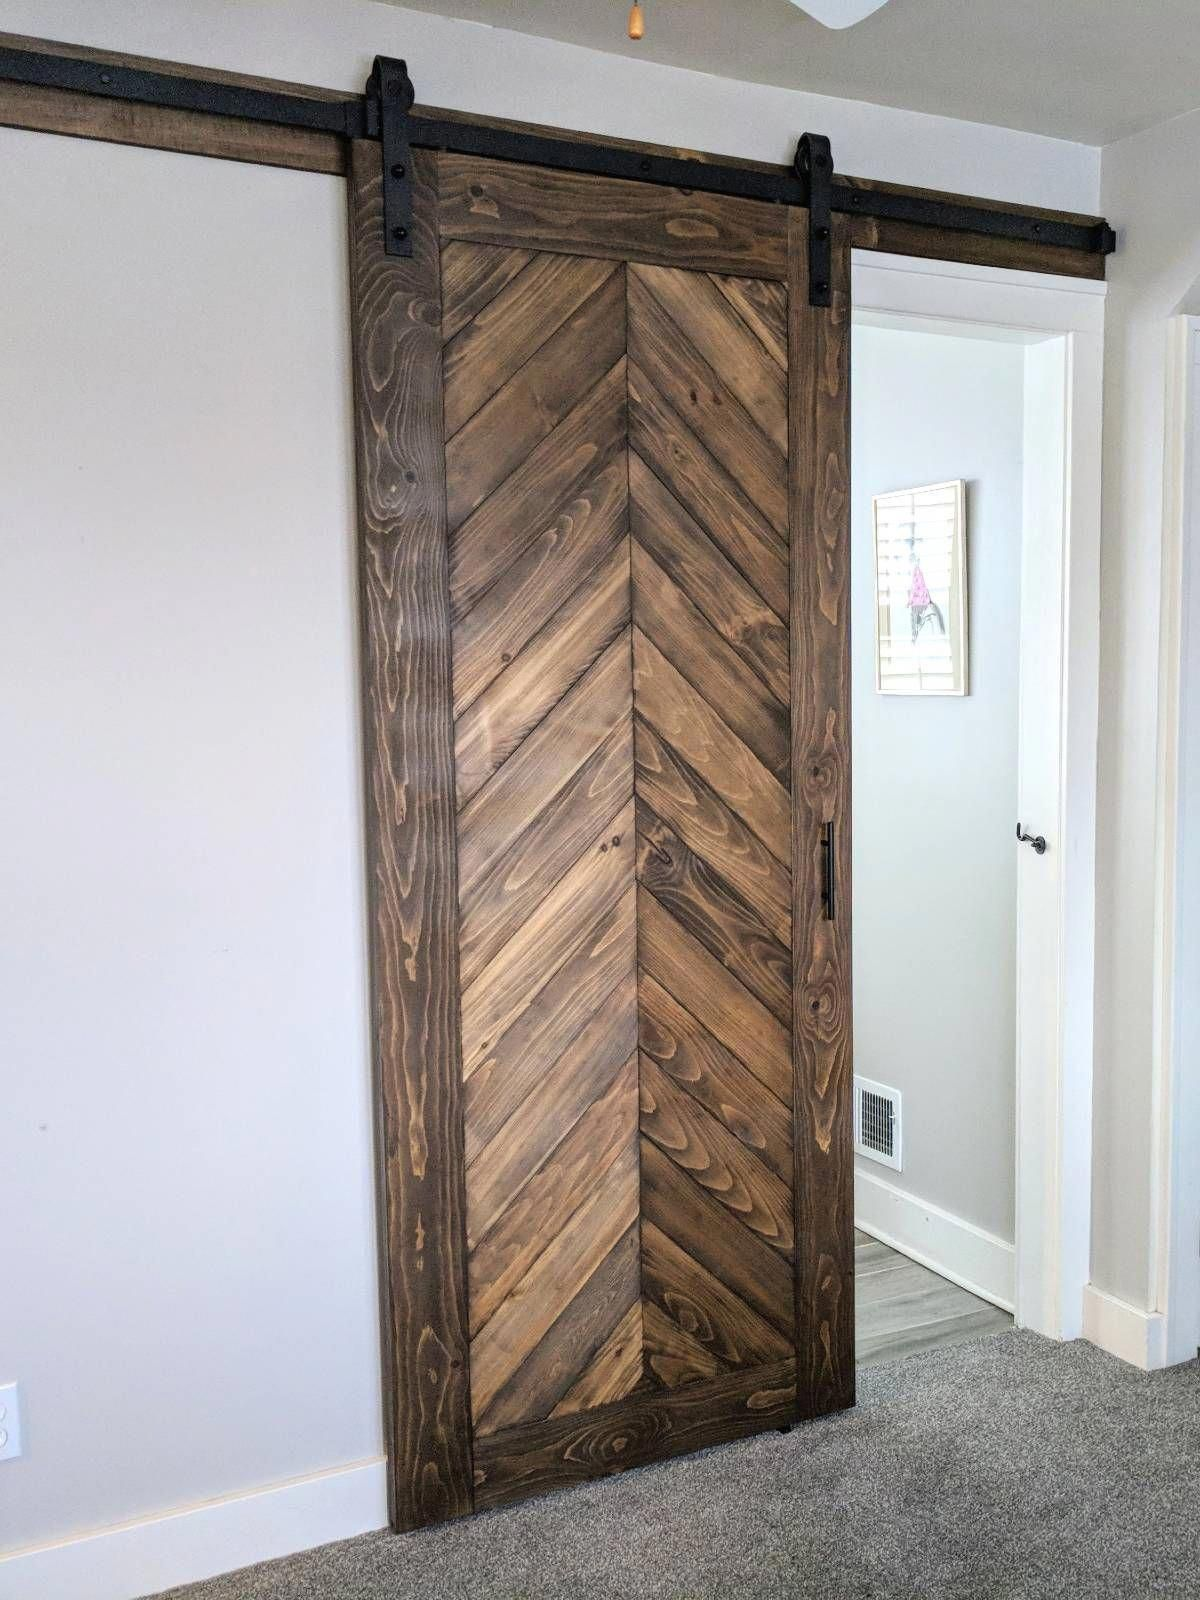 Astonishing Modern Interior Barn Doors Read Our Blog For Way More Designs Moderninteriorbarndoors In 2020 With Images Barn Door Barn Doors Sliding